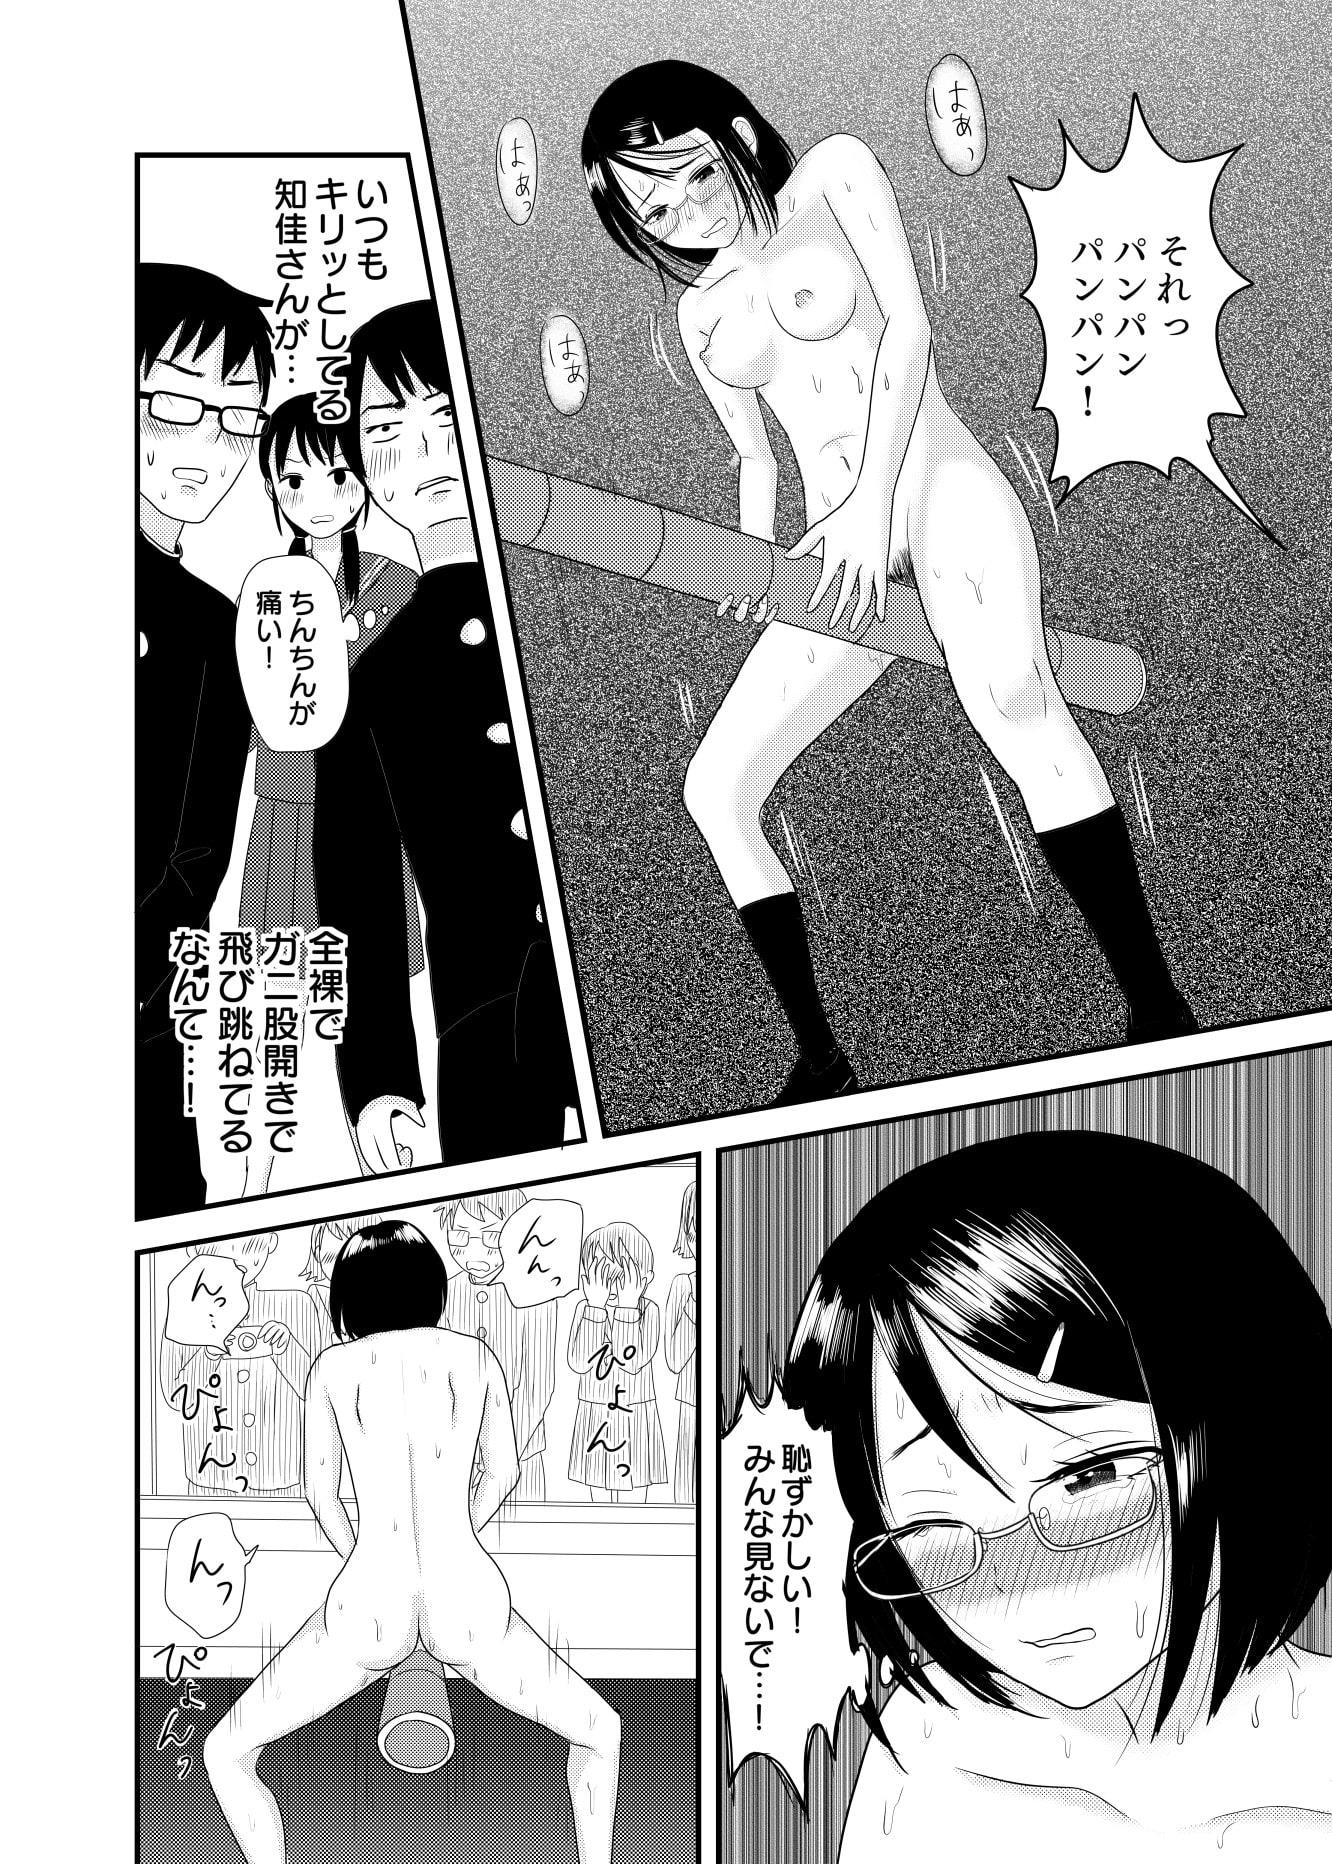 RJ325702 全裸羞恥竹打ちラーメン [20210429]